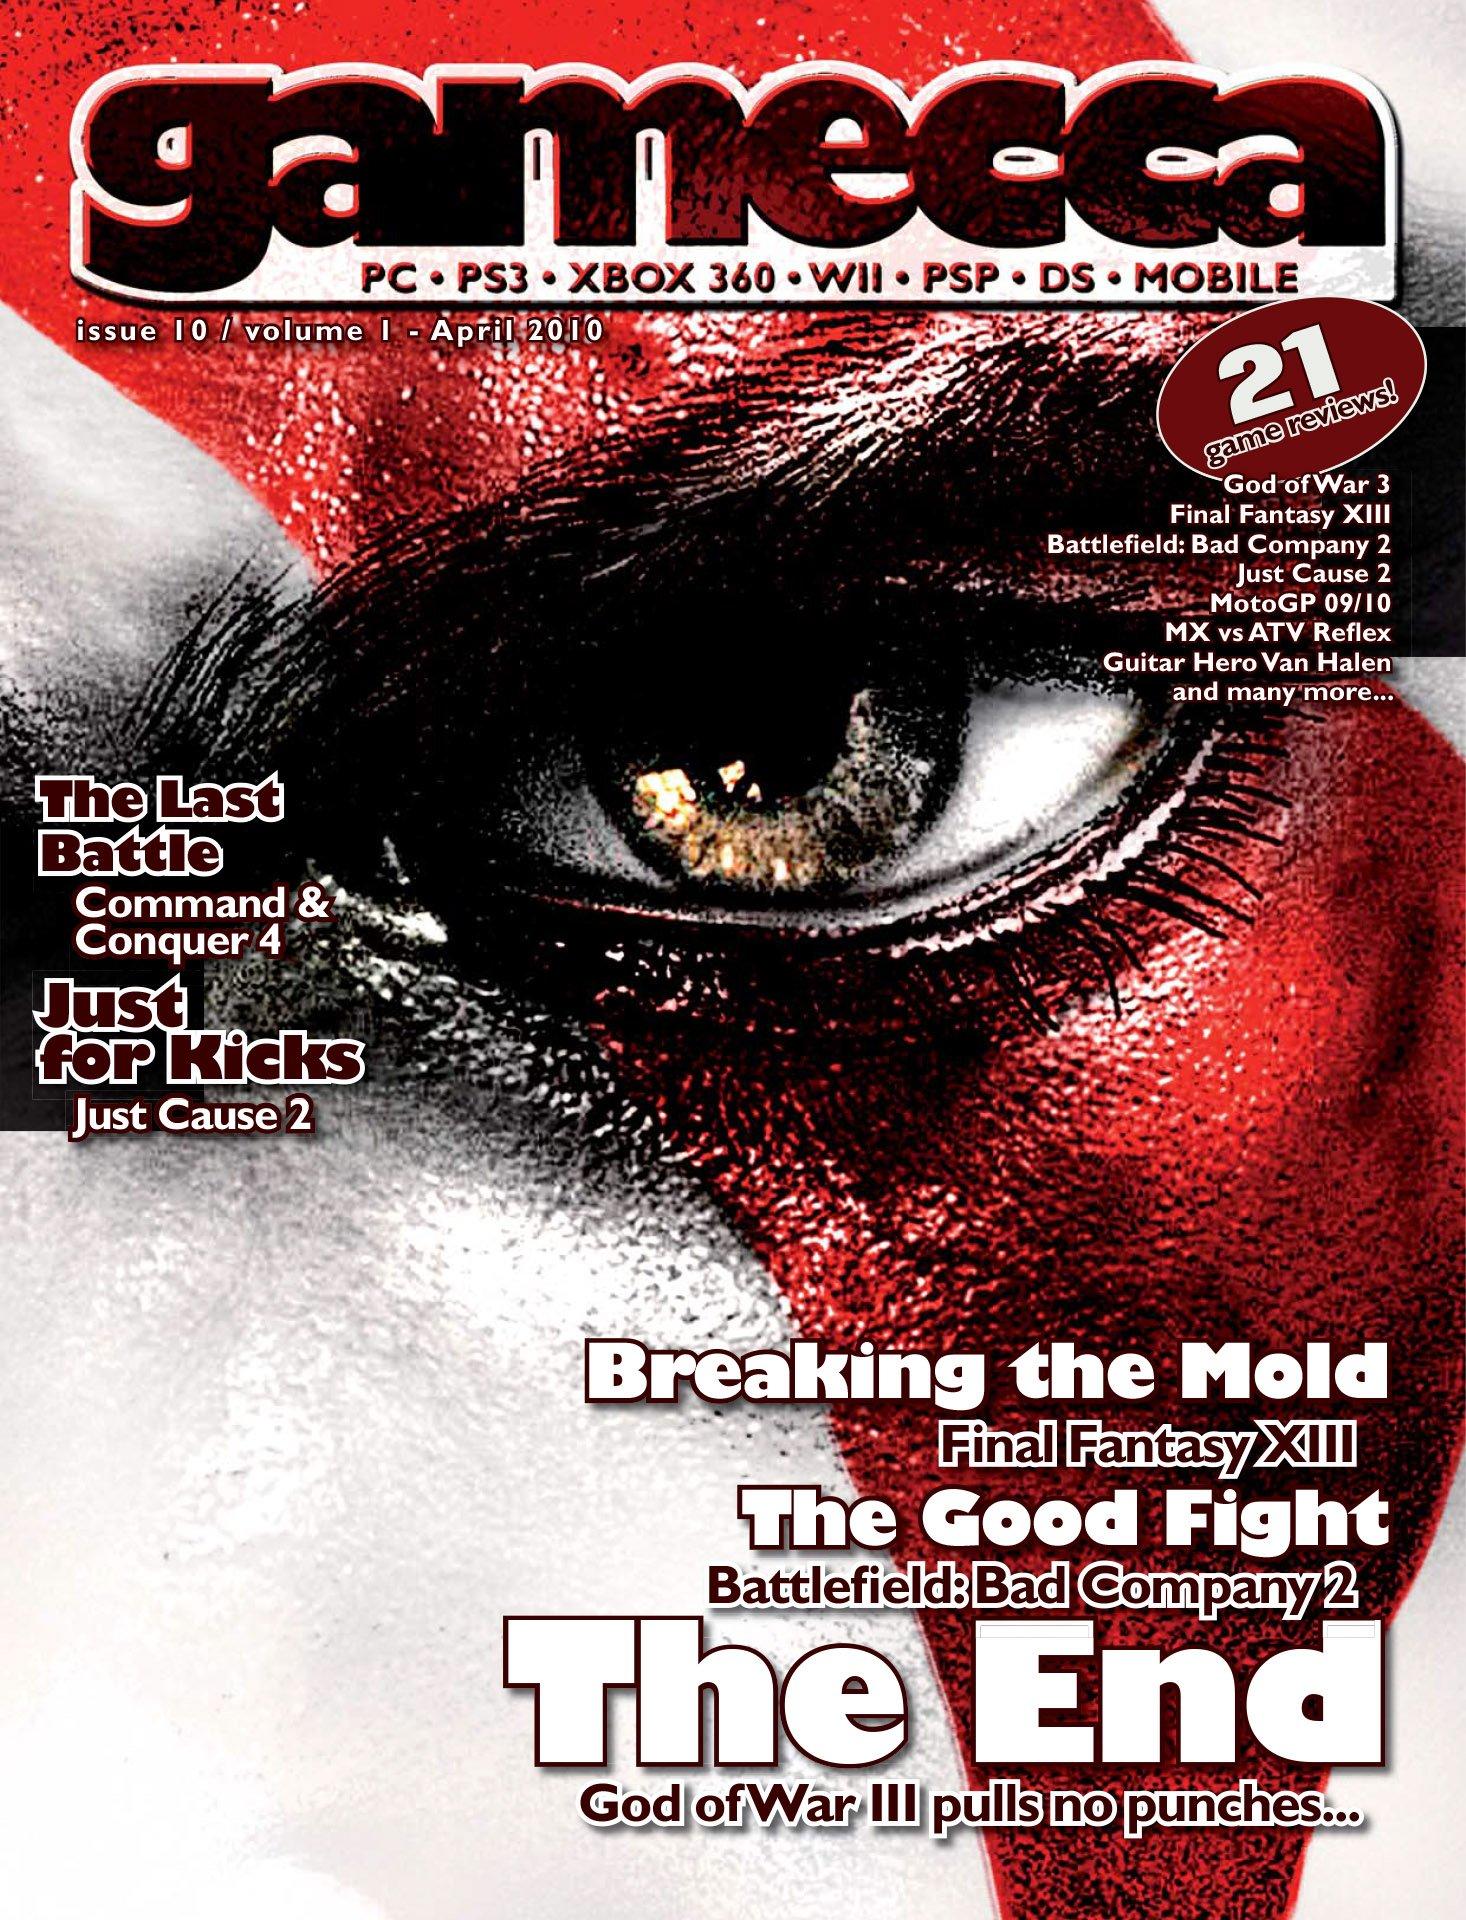 Gamecca 010 (April 2010)